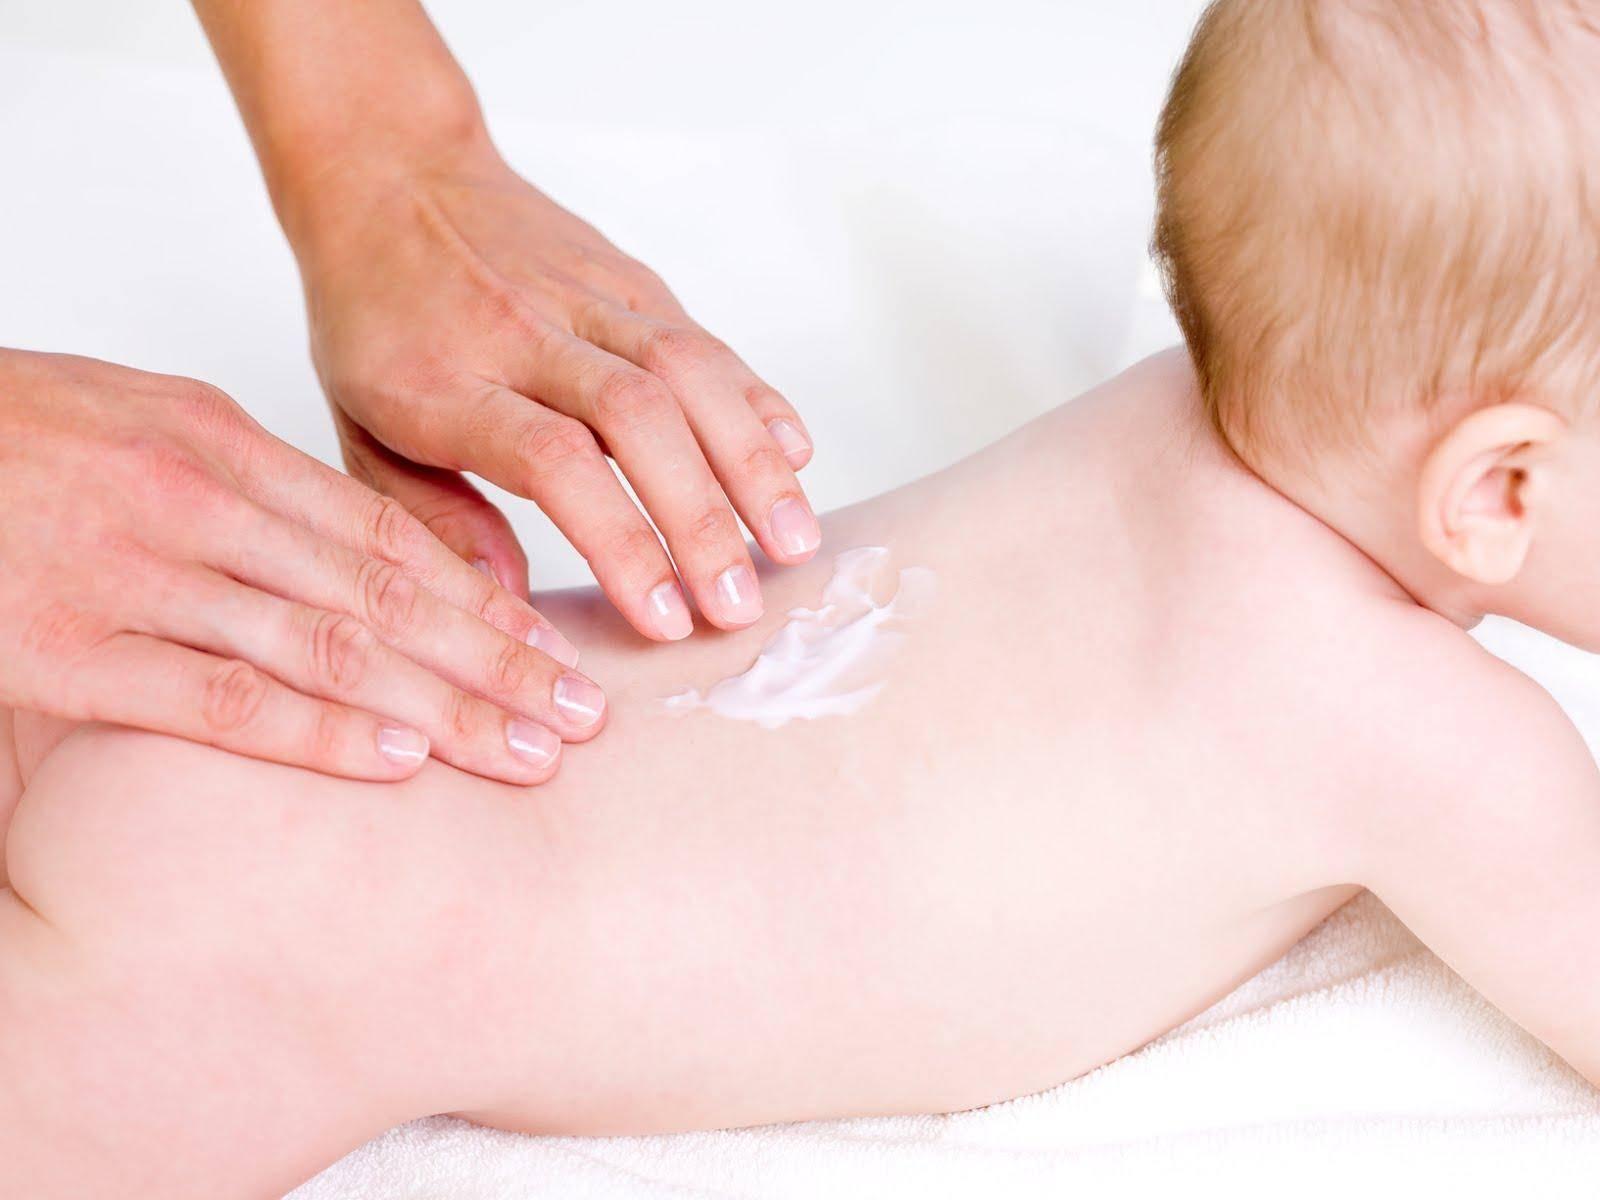 Мраморная кожа у грудничка: патология или норма?